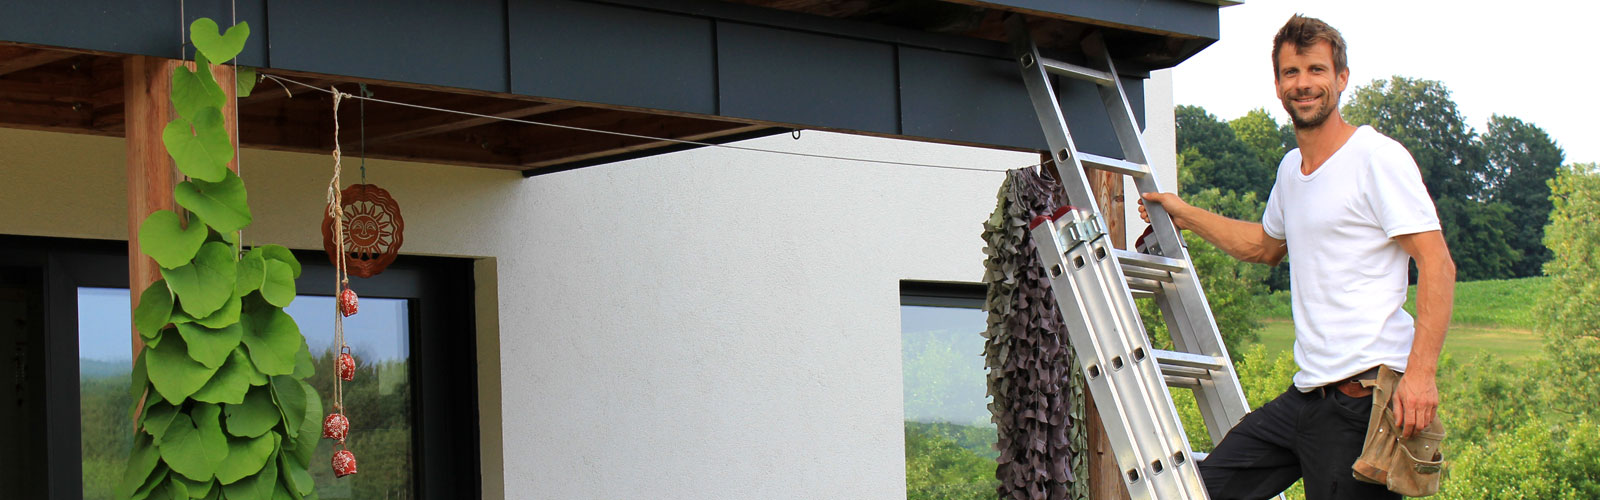 Spengler auf Leiter